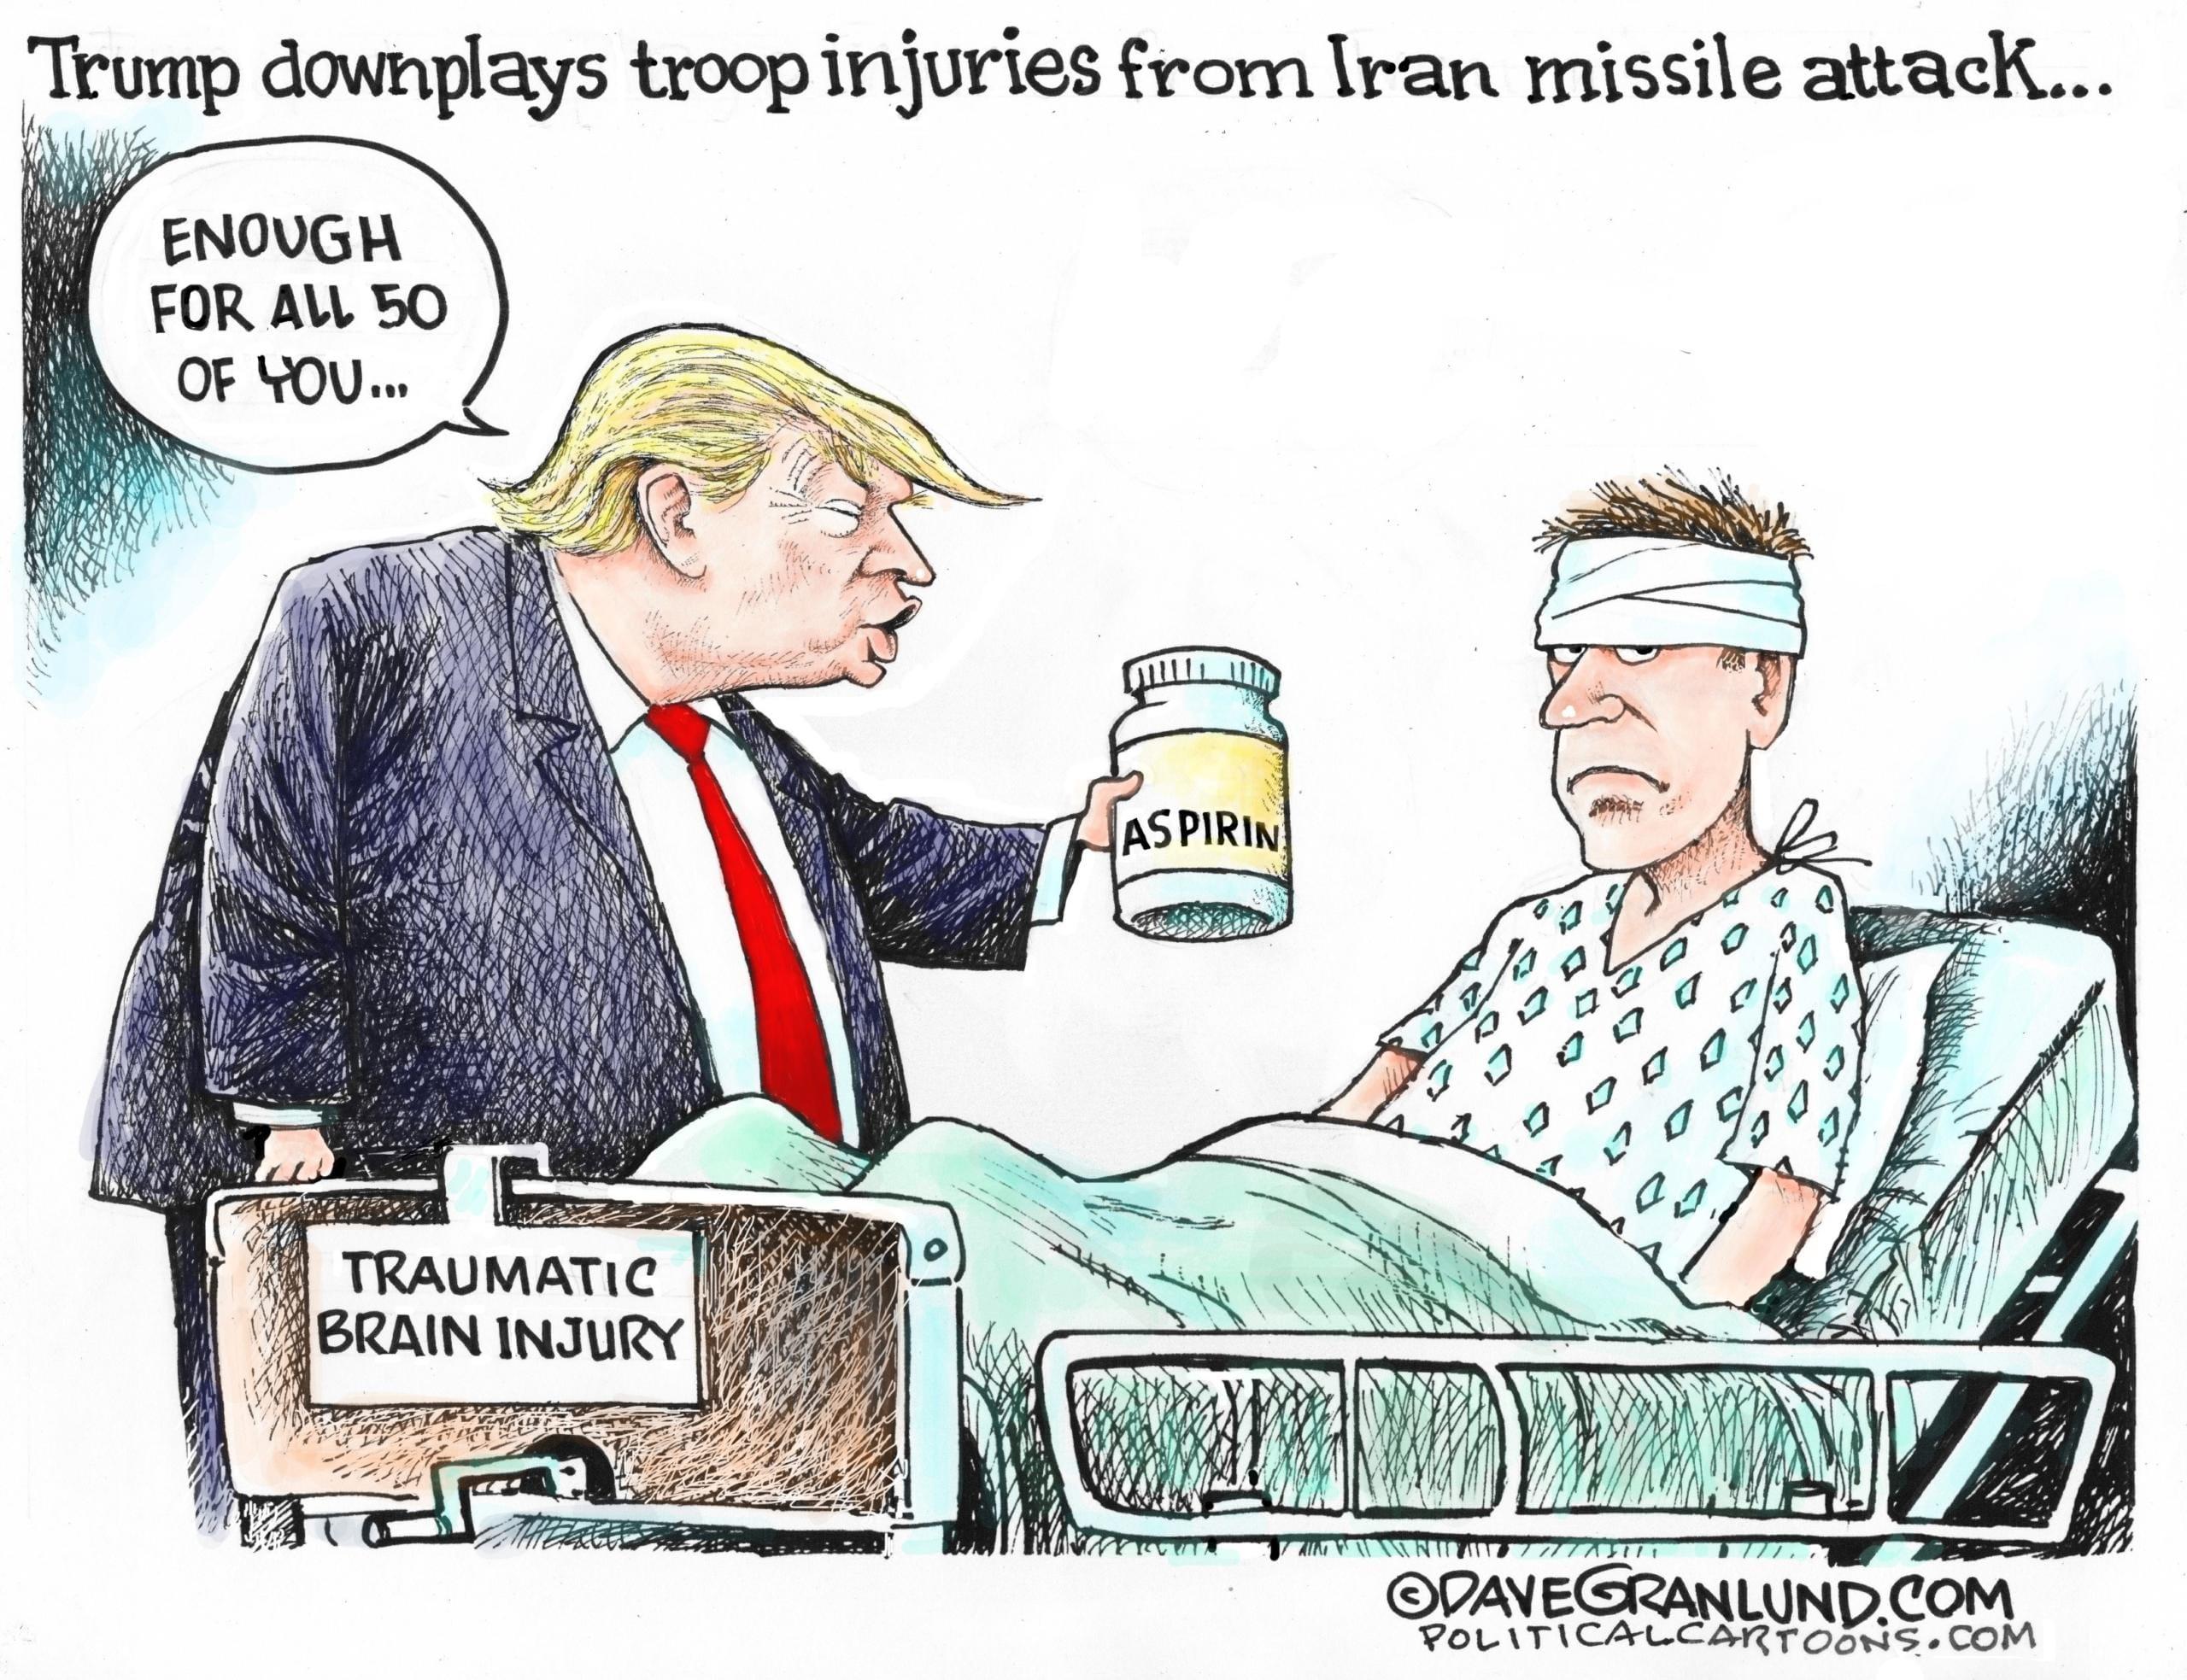 Feb. 1: Trump With Aspirin